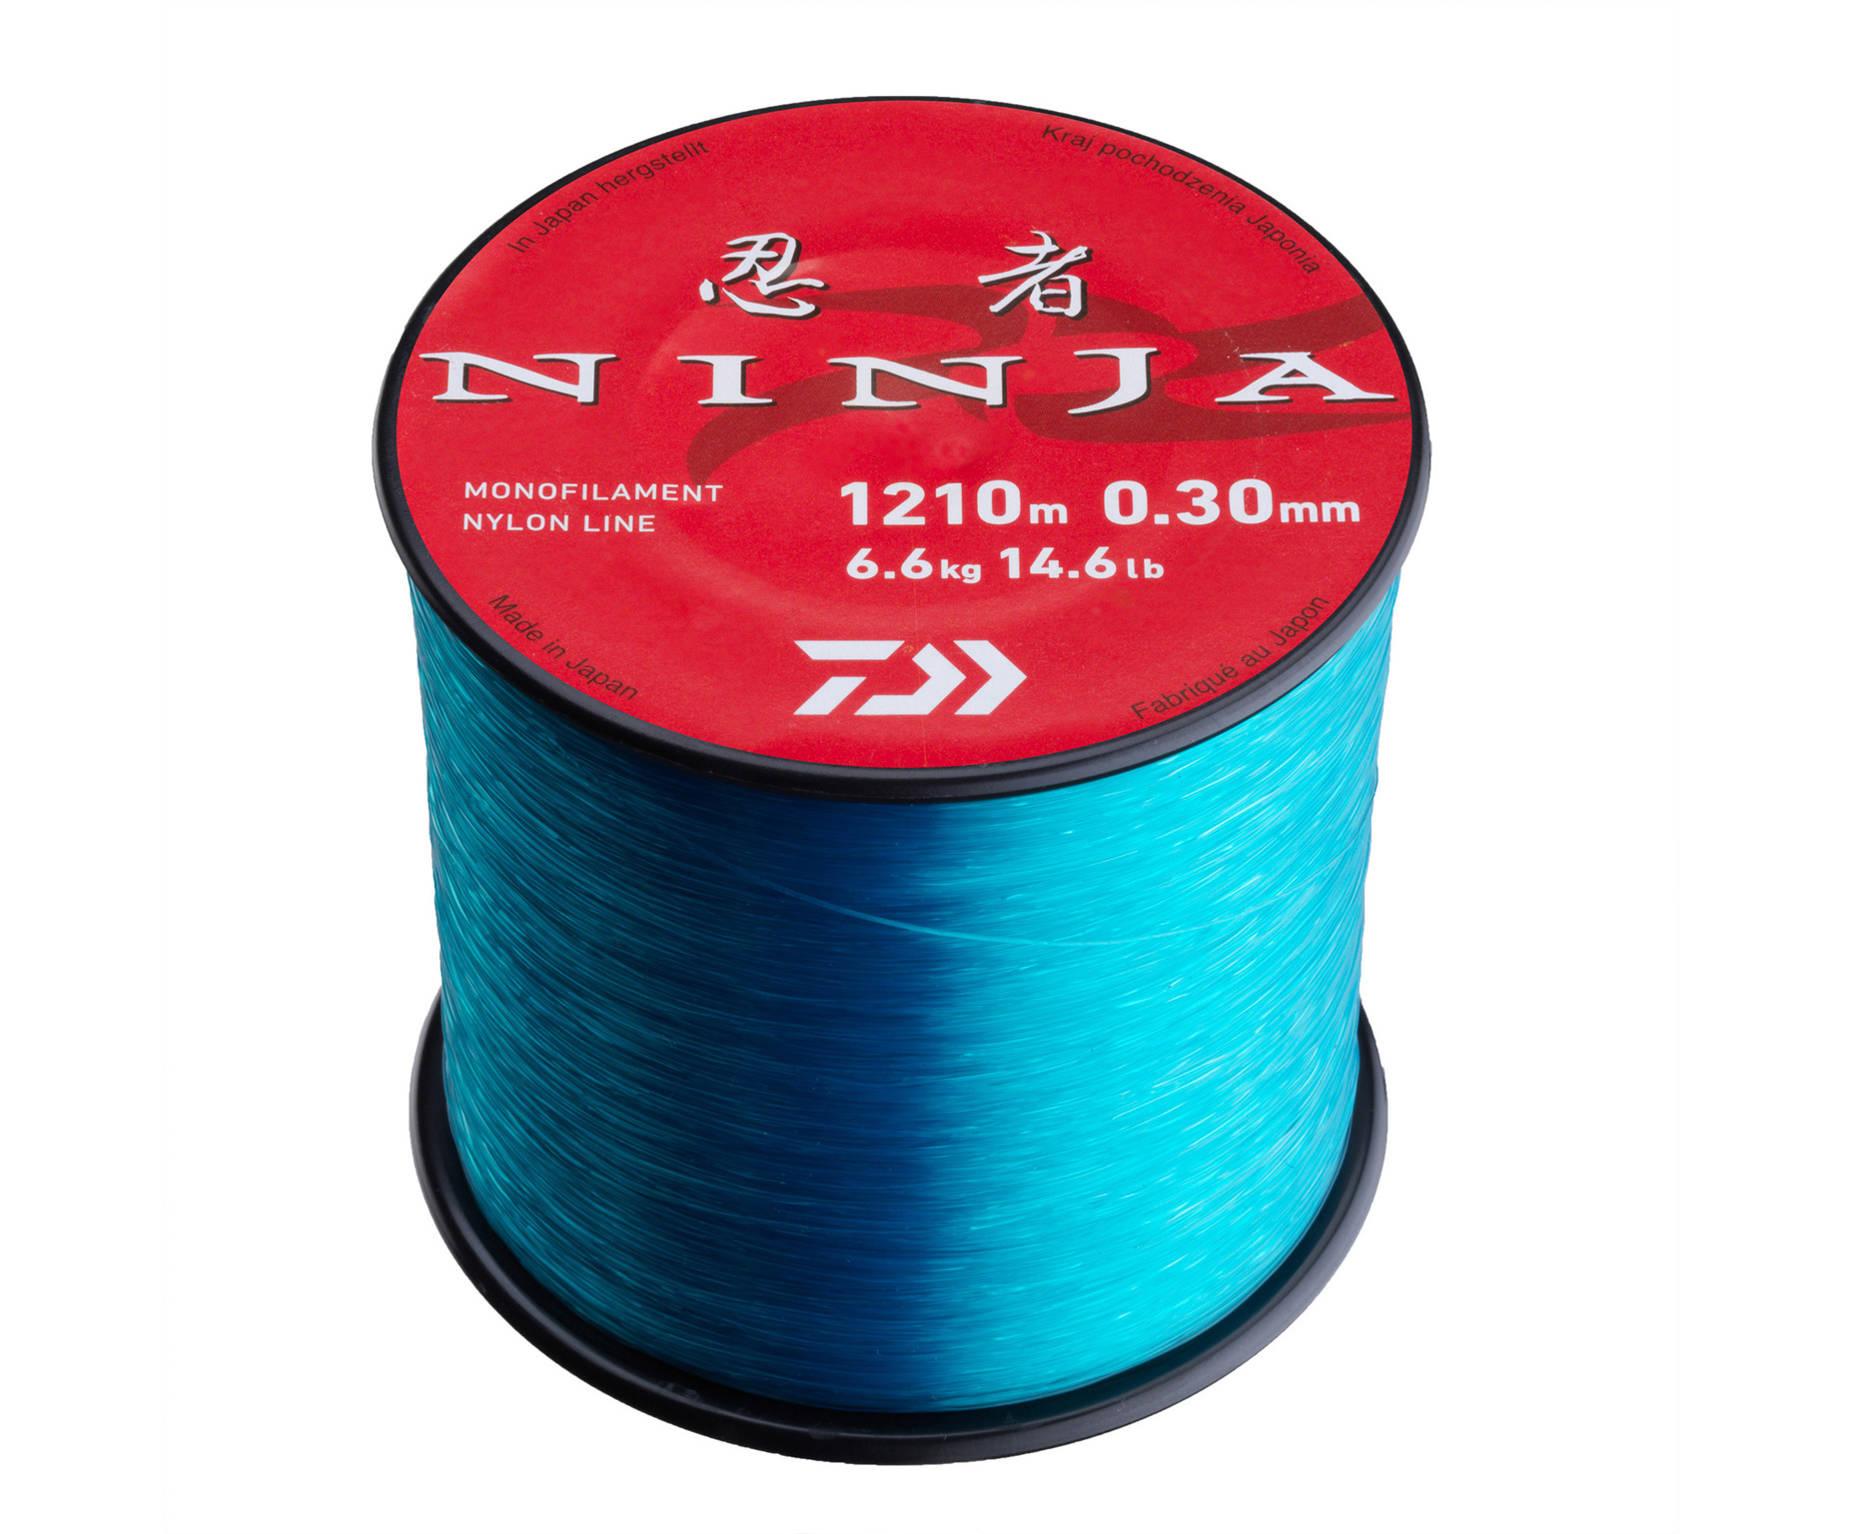 Daiwa ¯y³ka Ninja X Mono - 840m 0.36mm 9.2kg